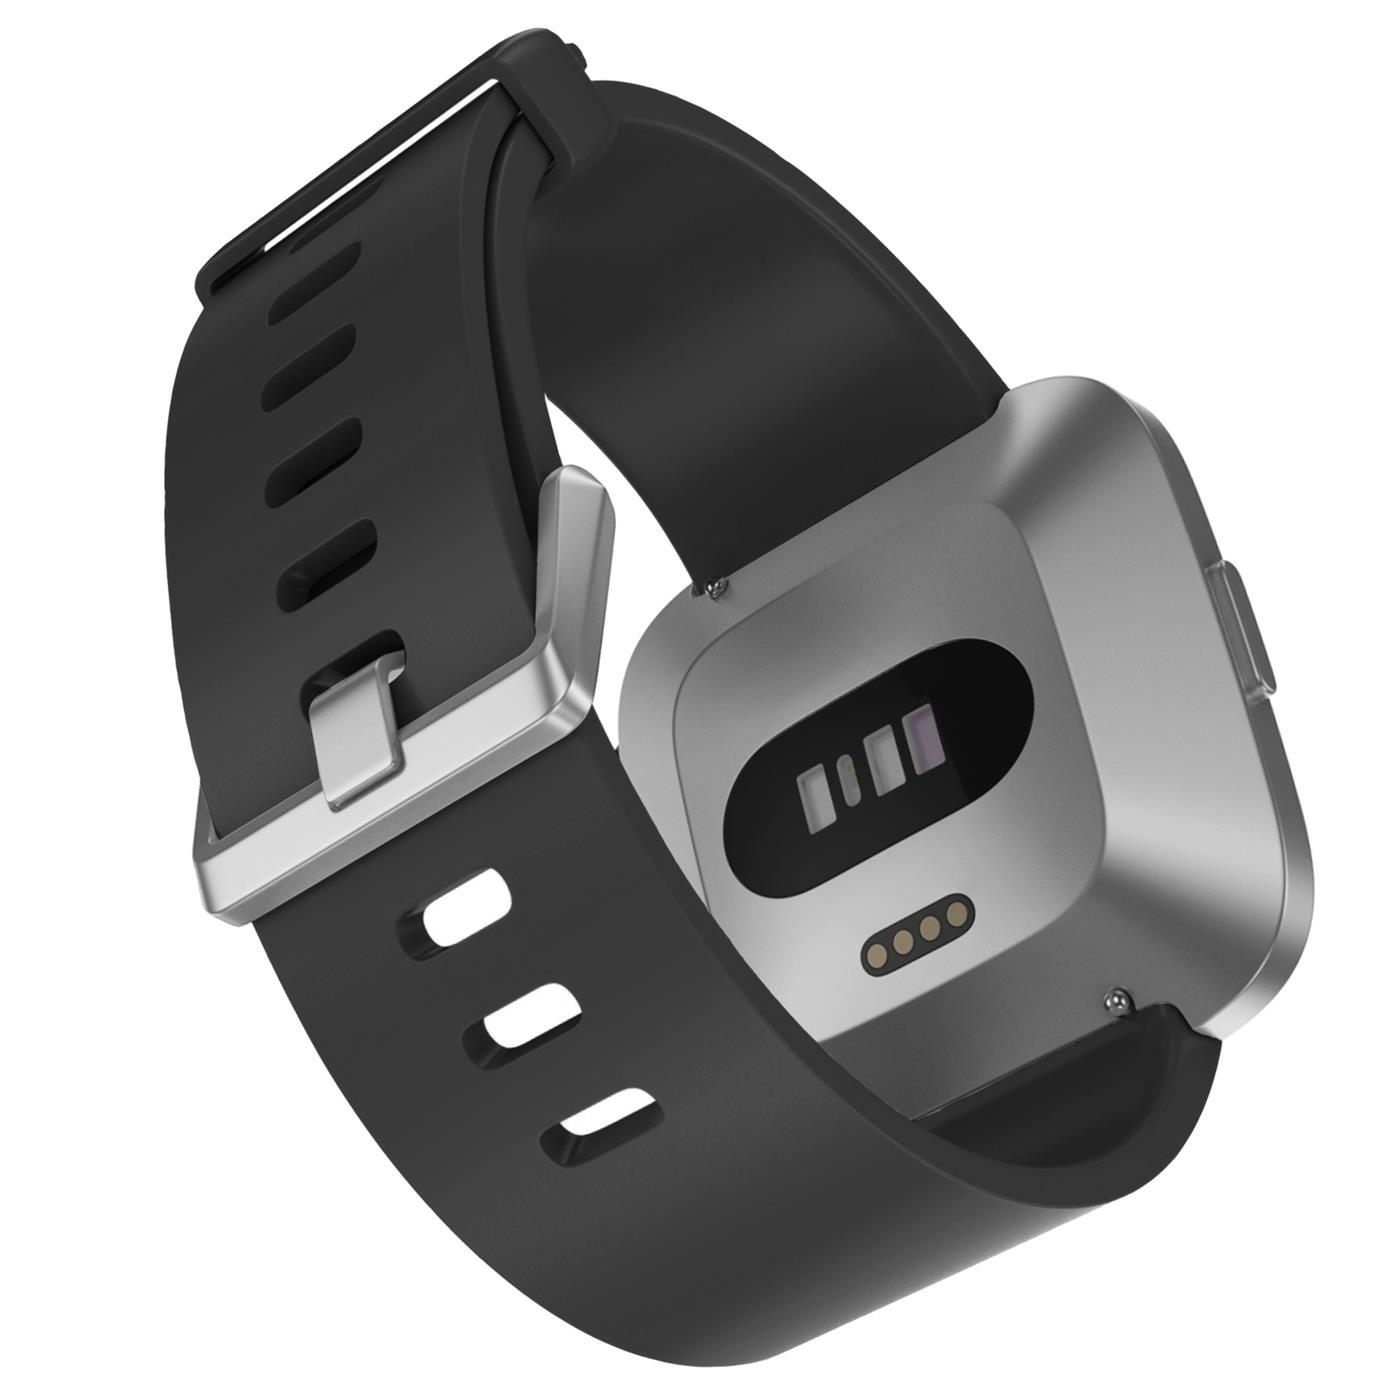 Fitbit-Groesse-S-oder-L-Ersatz-Silikon-Armband-Uhren-Sport-Band-Fitness-Tracker Indexbild 38